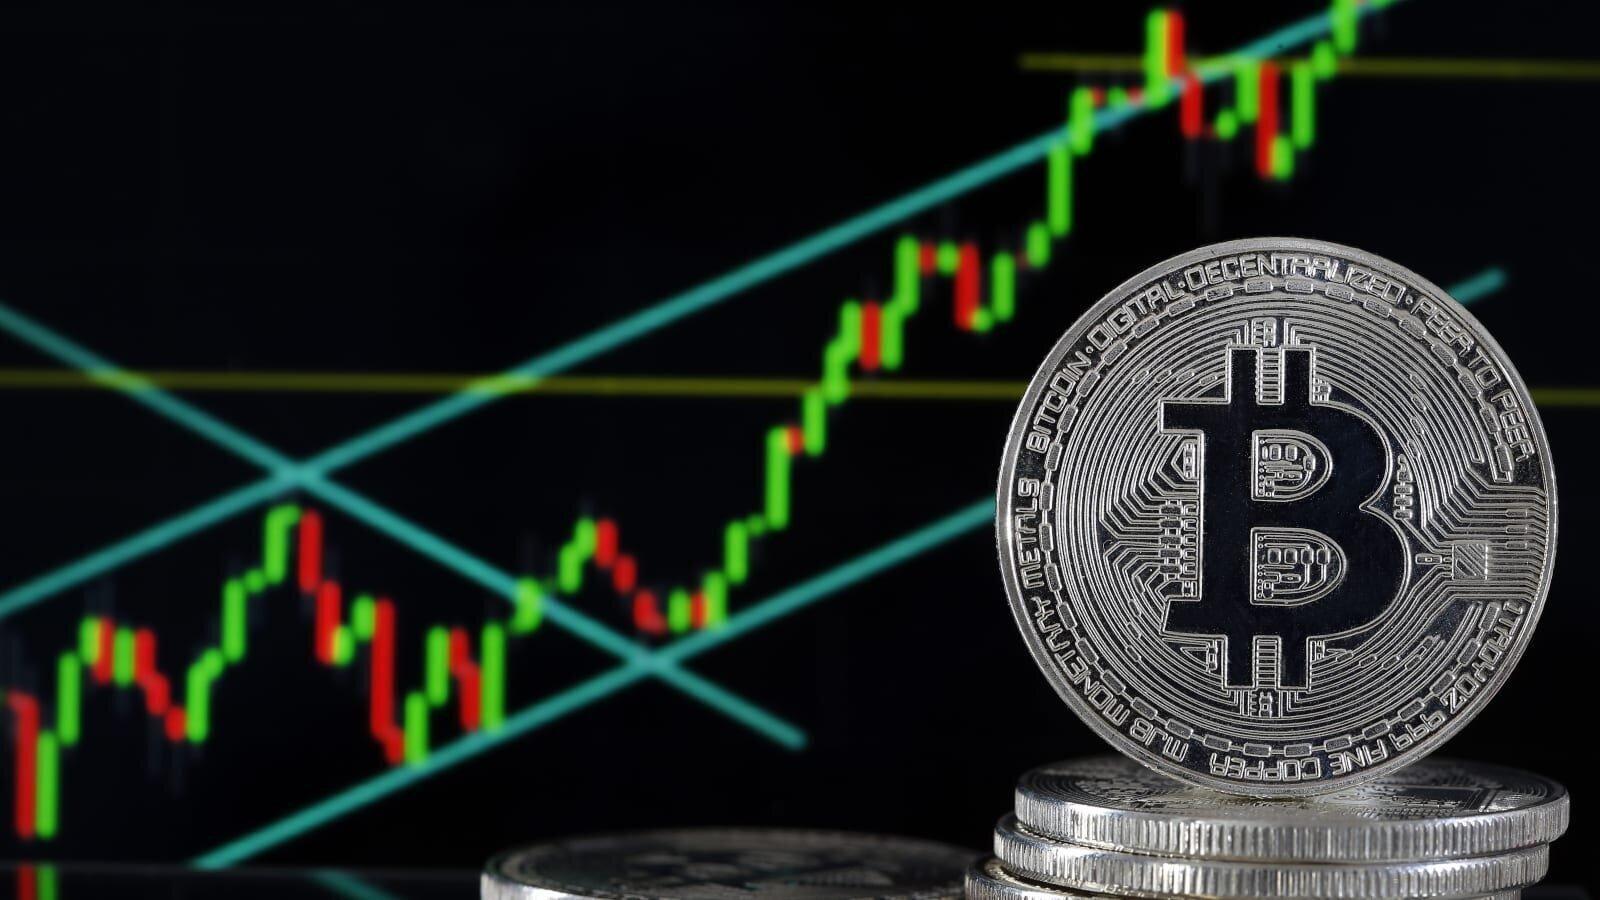 Bitcoin as Open Public Blockchain Peer to Peer Magical Internet Money Versus Fiat CBCD